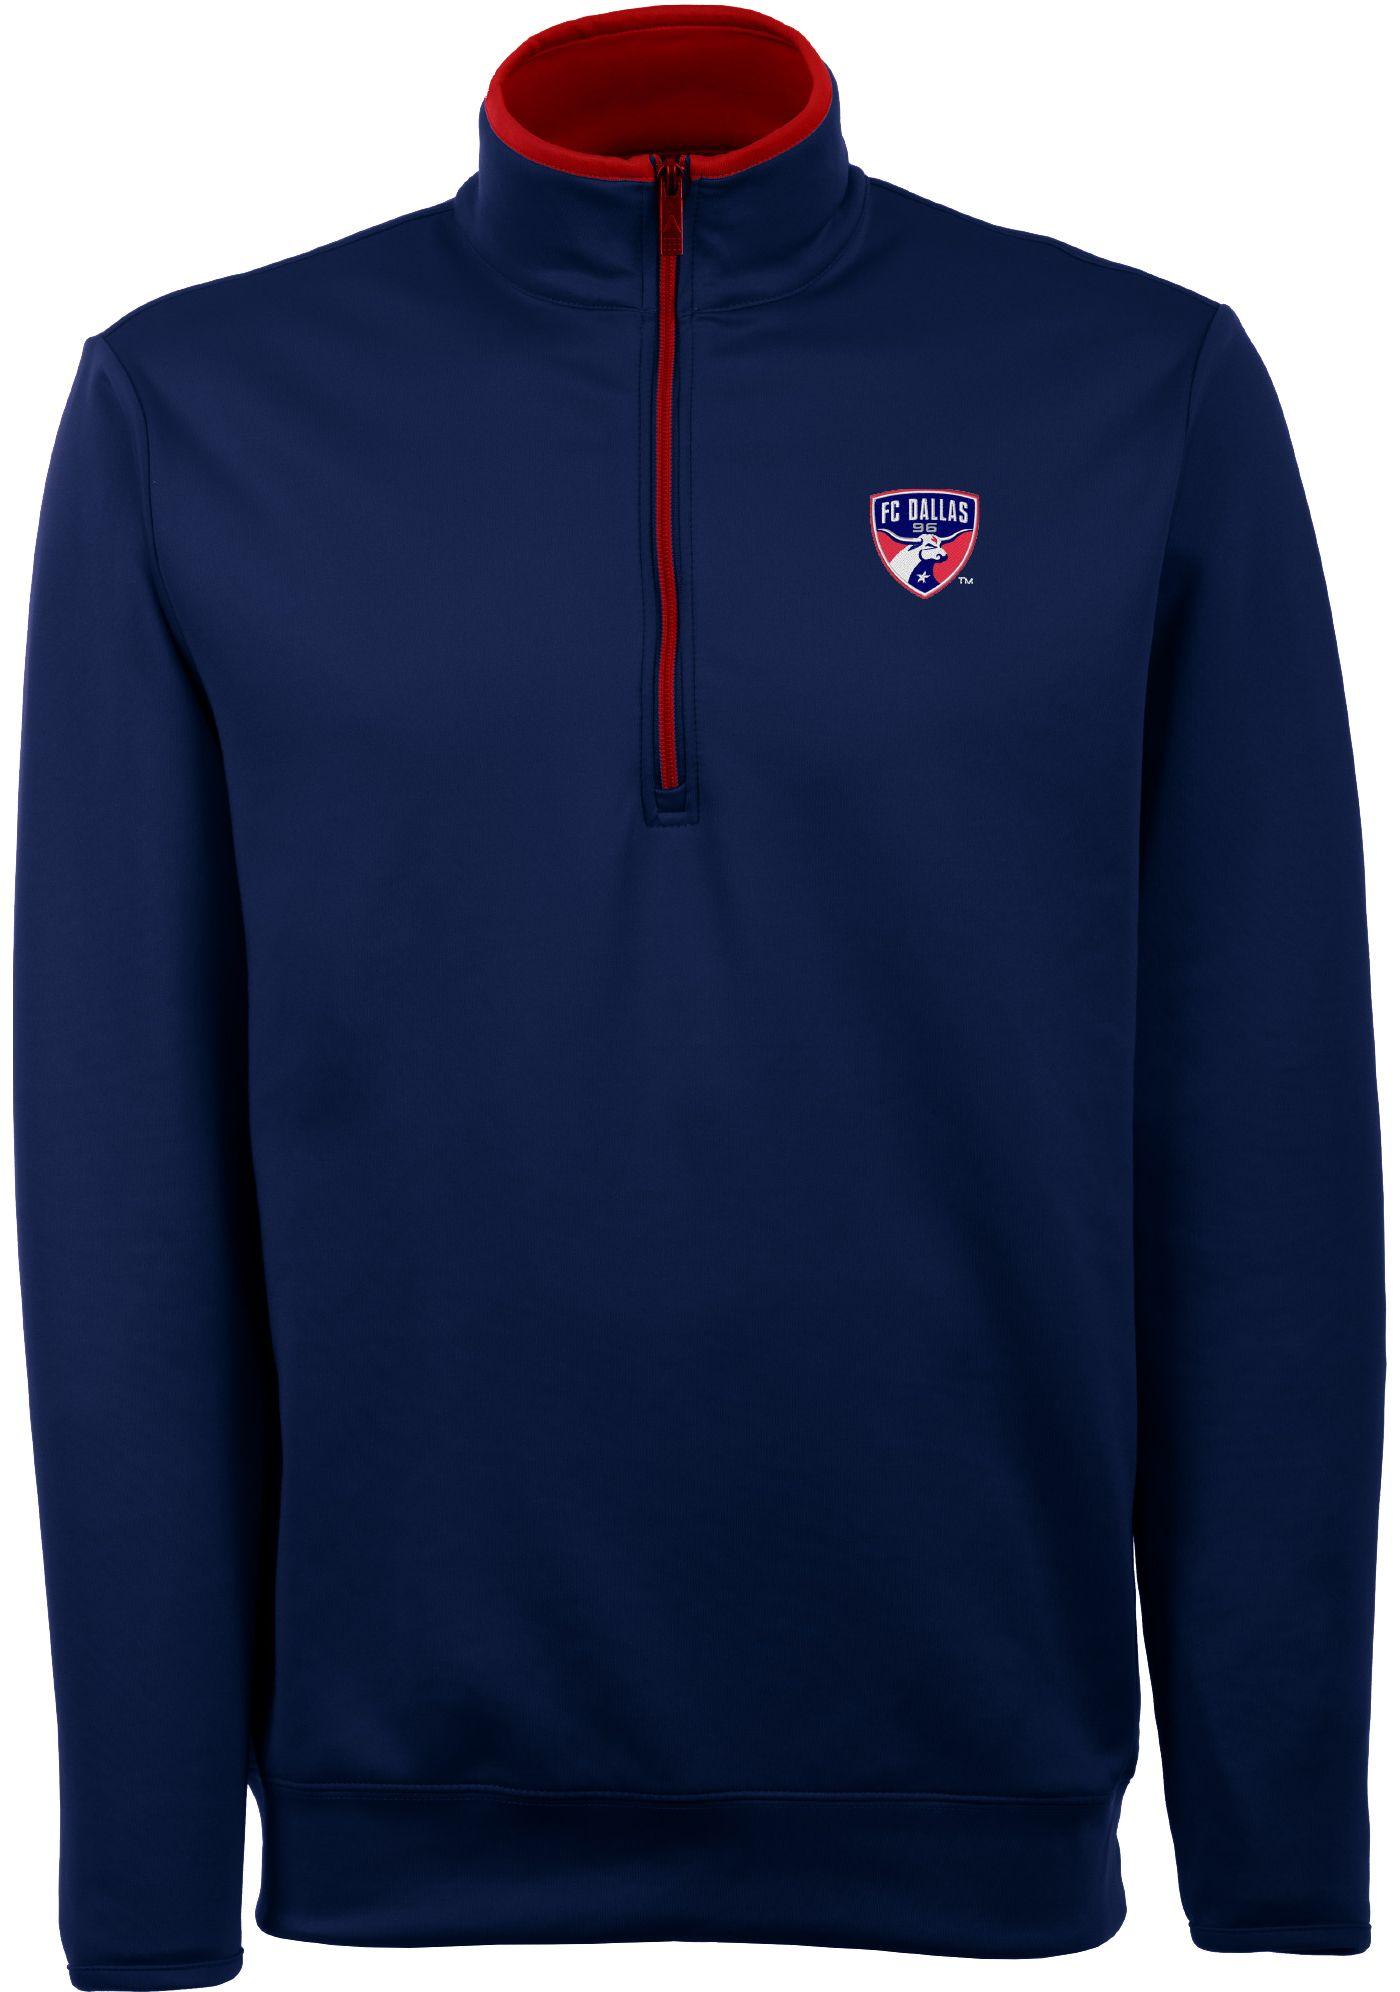 Antigua Men's FC Dallas Leader Navy Quarter-Zip Jacket